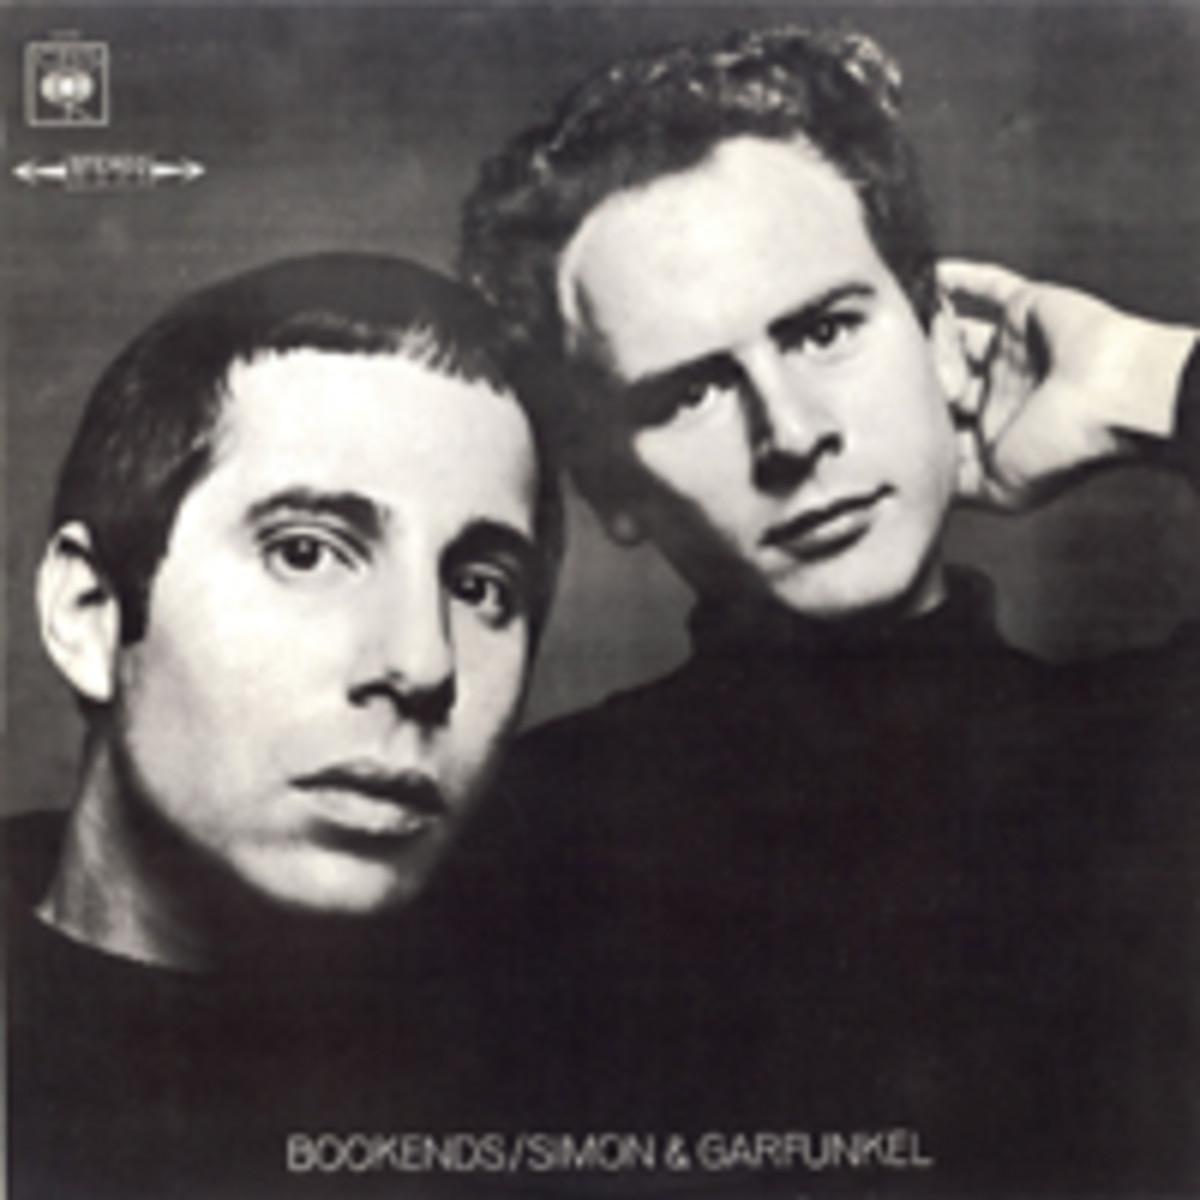 Simon and Garfunkel Bookends